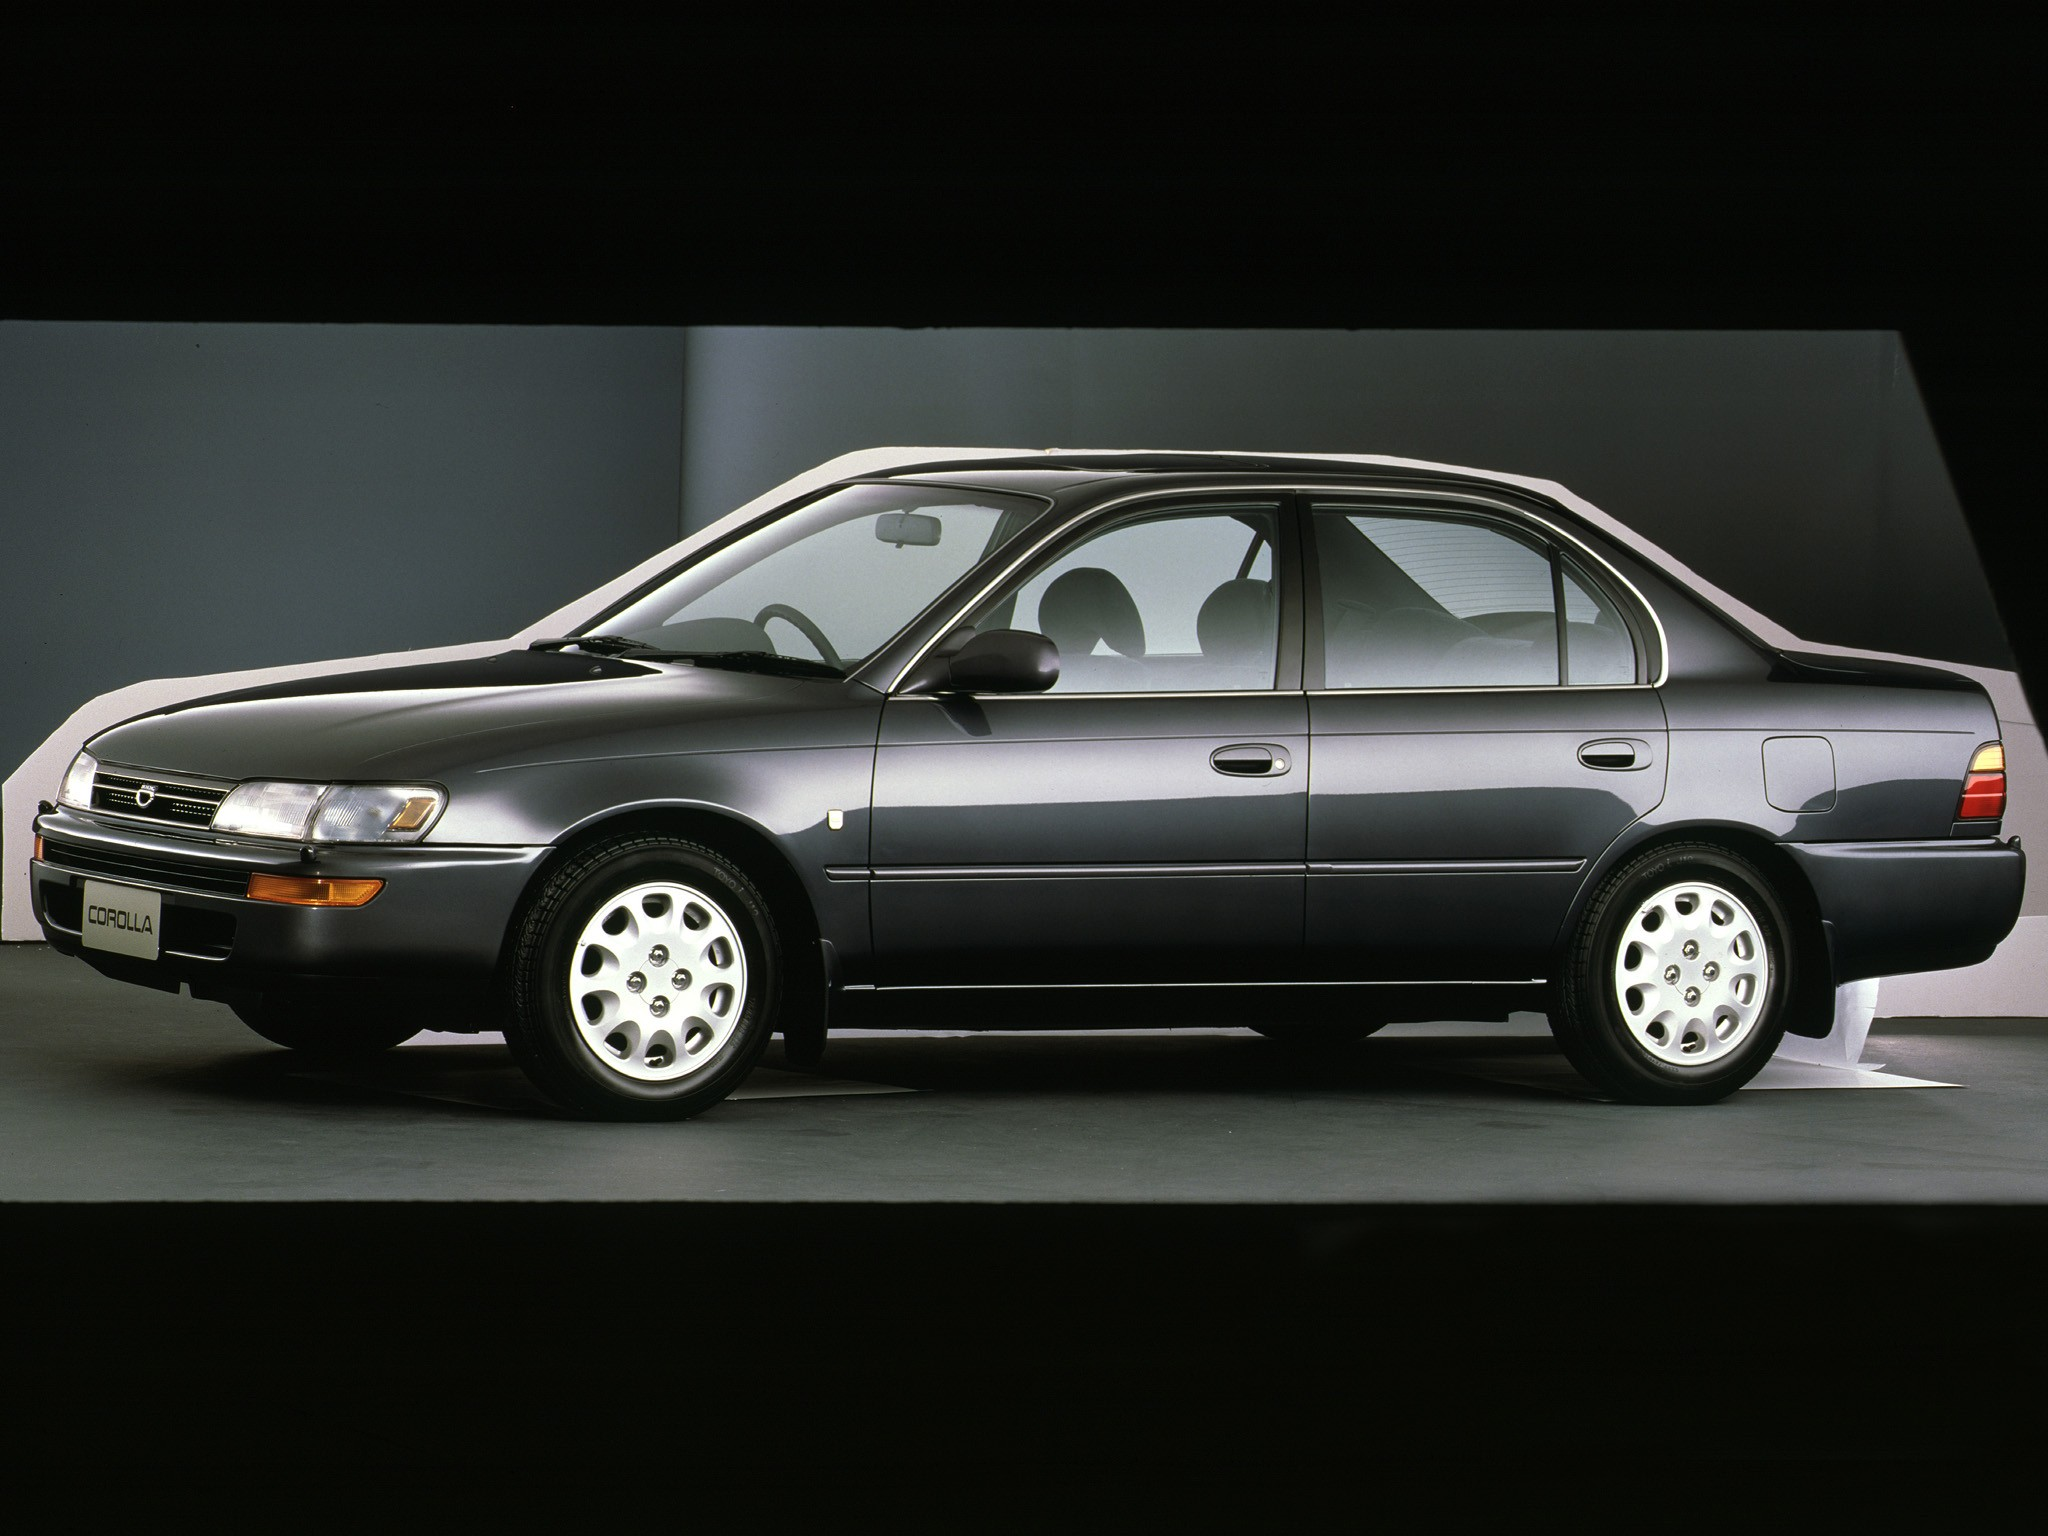 Kelebihan Toyota Corolla 1992 Tangguh